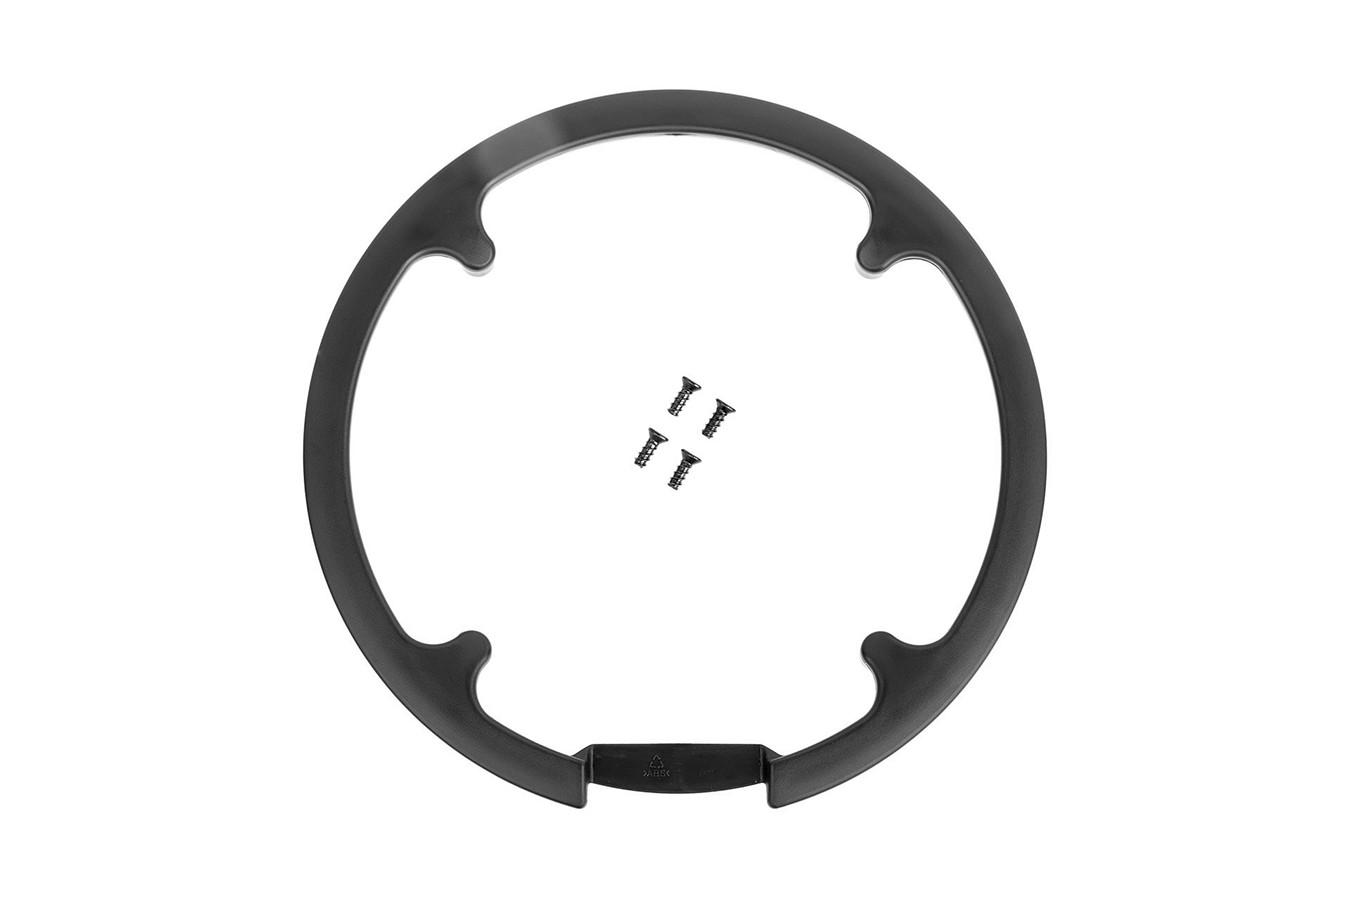 Pedivela 24/32/42 FC-M522 - Shimano